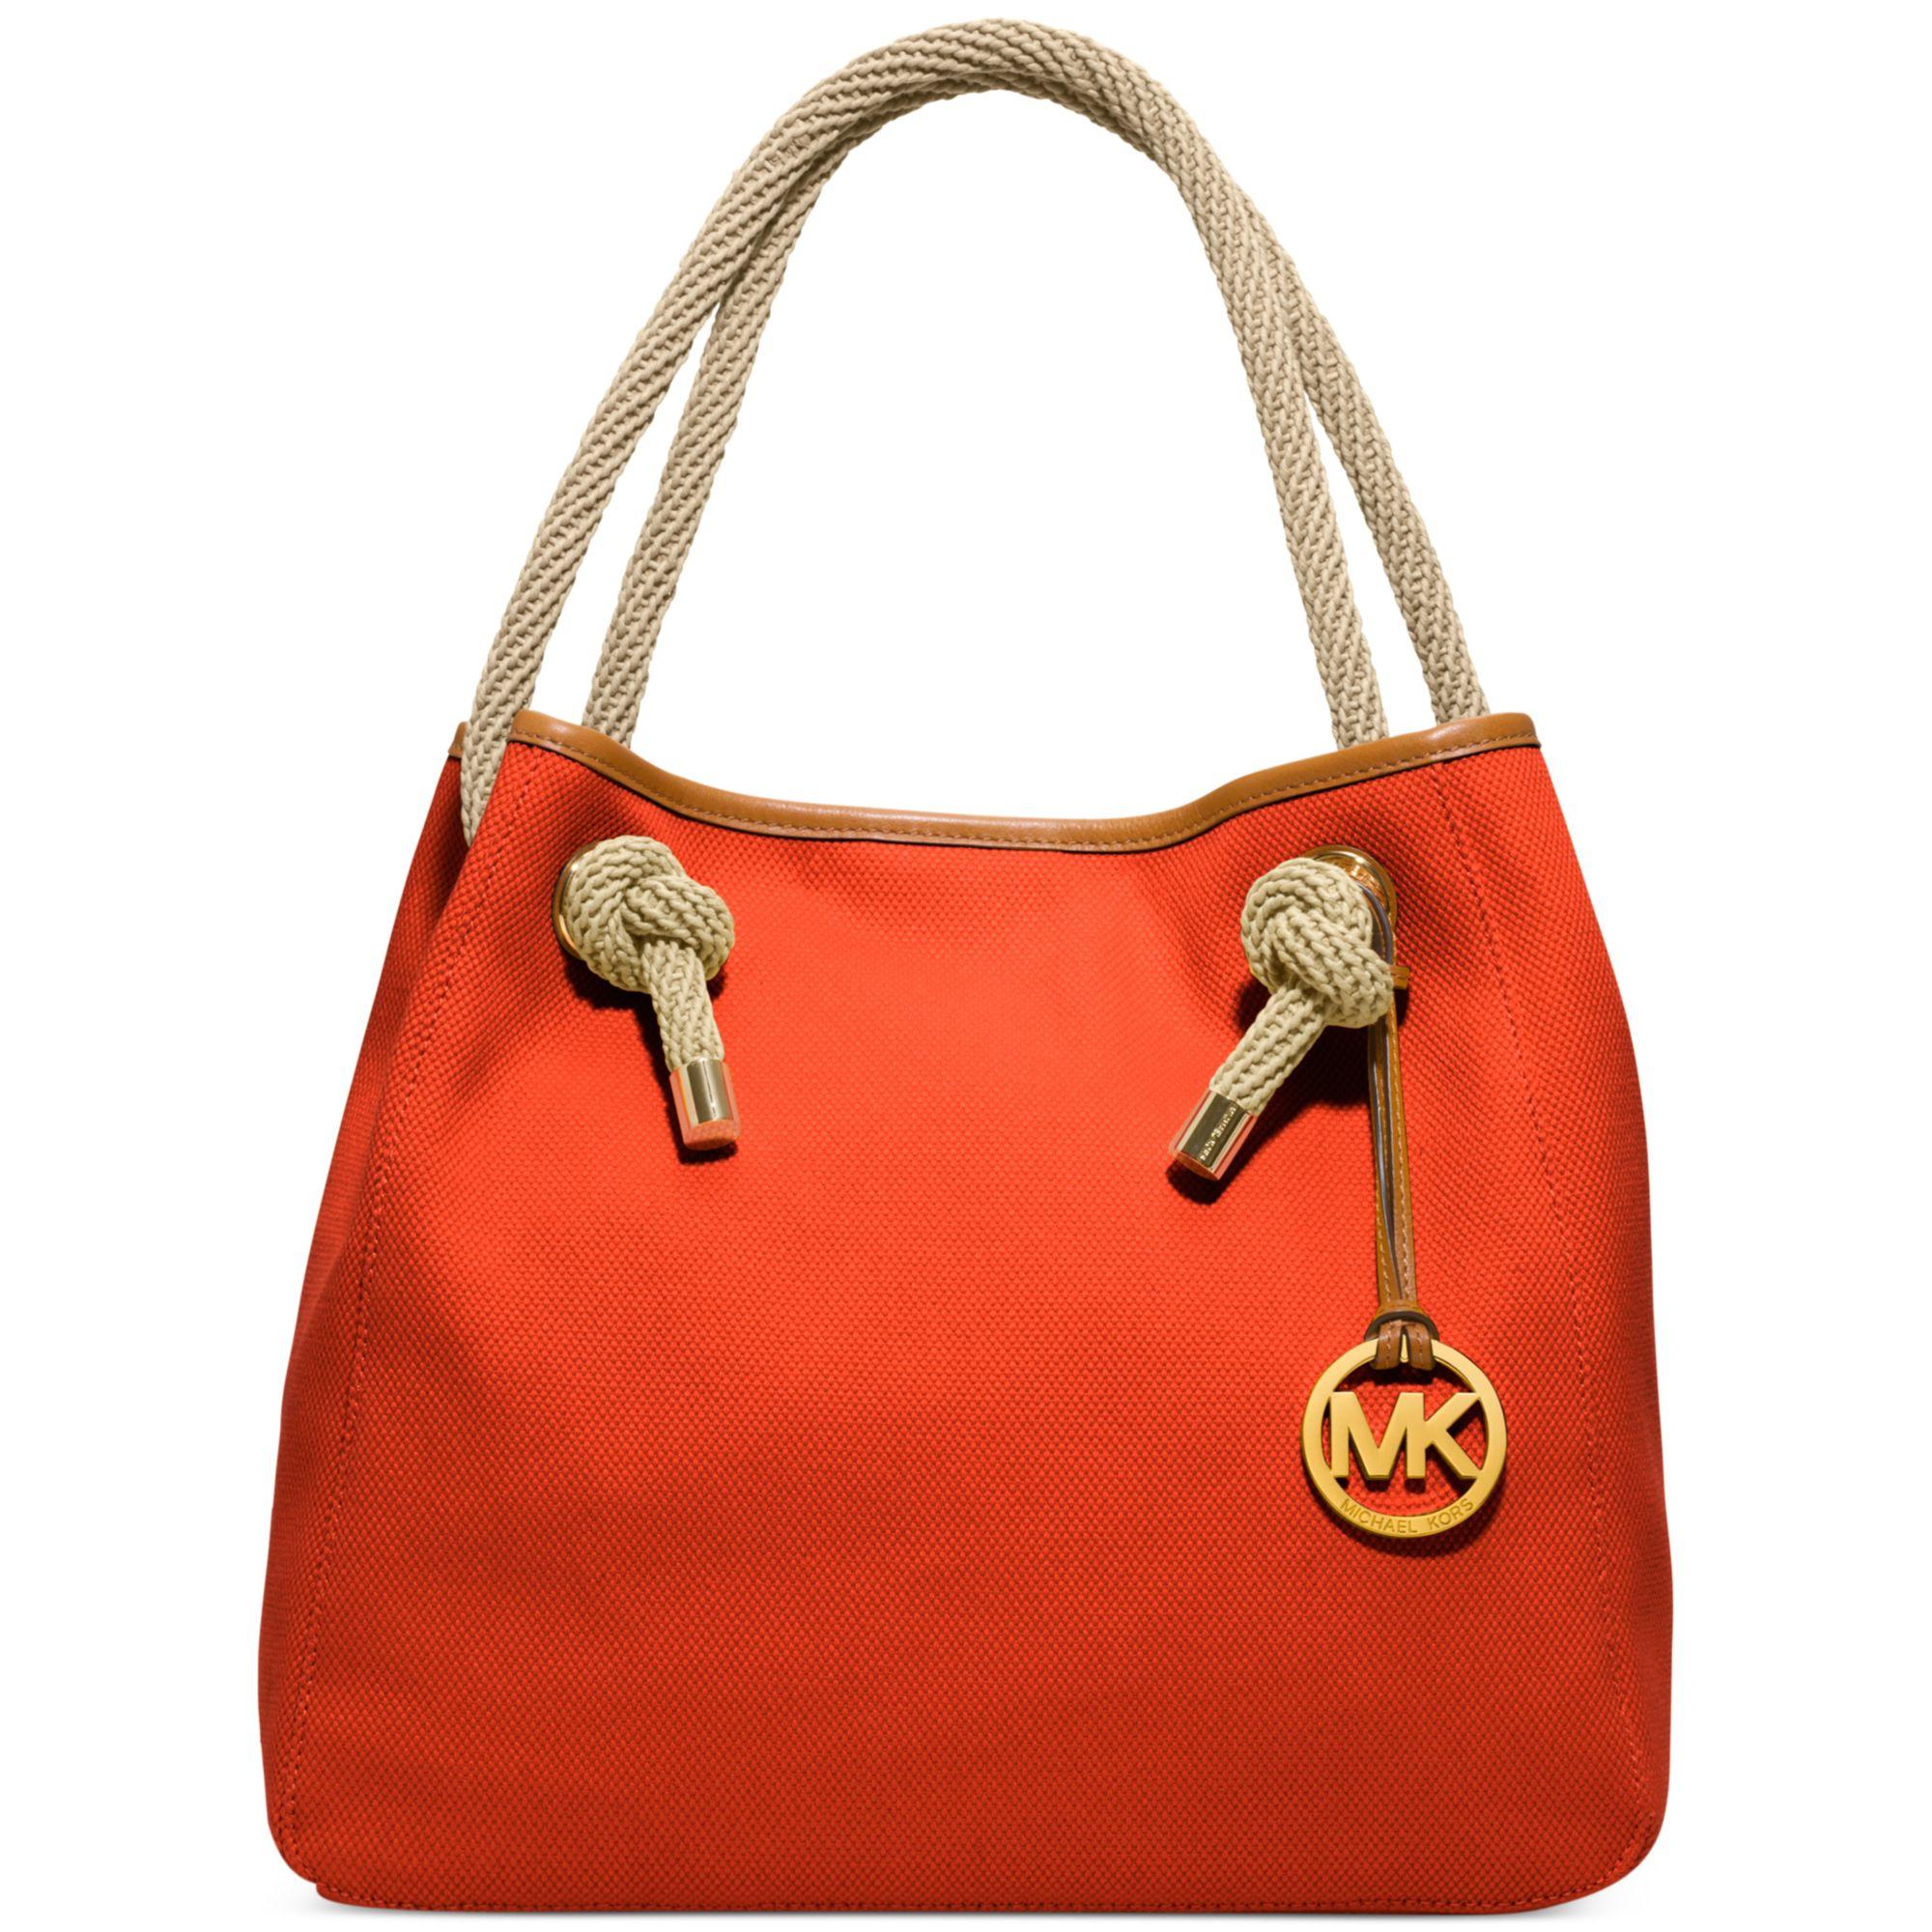 Bolsa Michael Kors Marina : Lyst michael kors marina large grab bag in orange